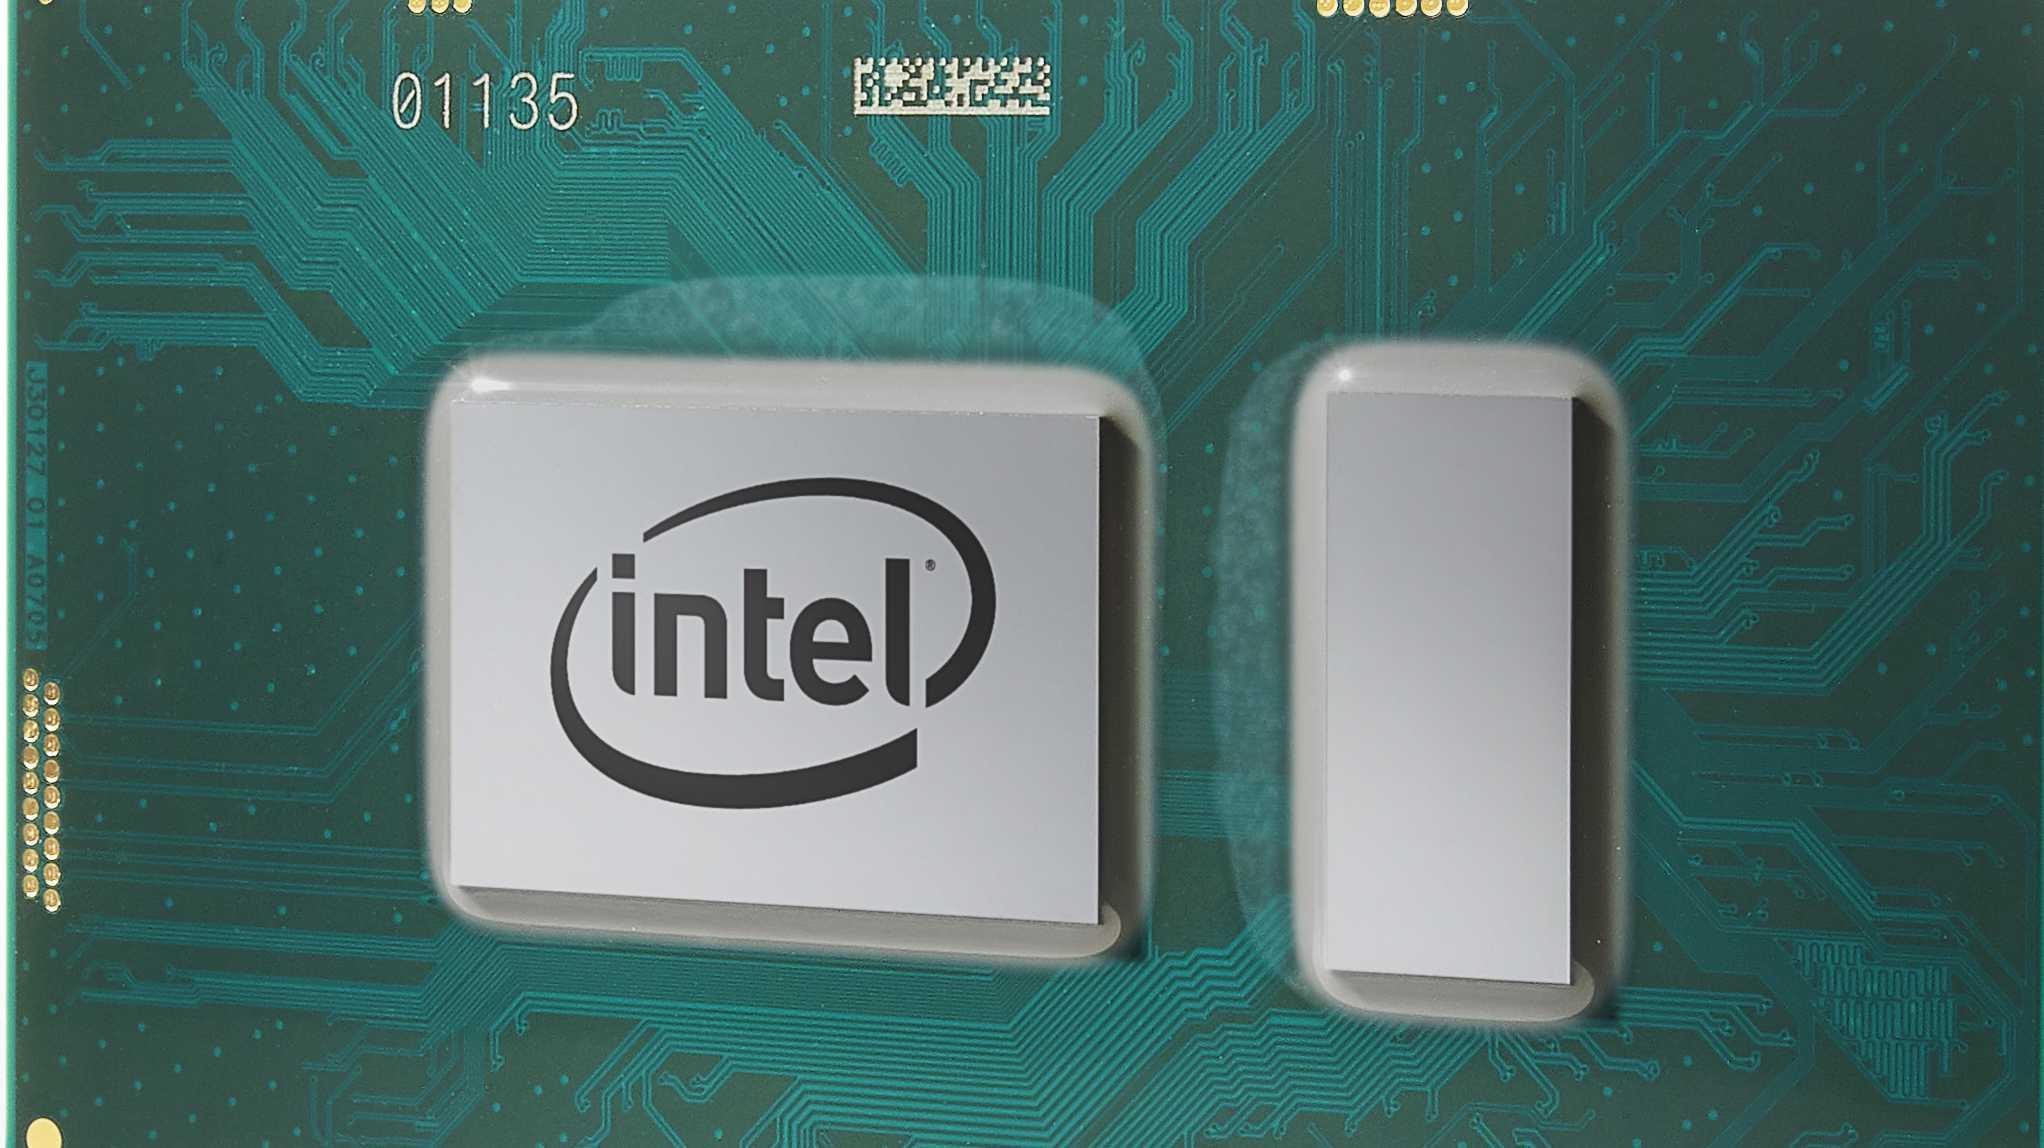 Mobil-CPUs für Business-Notebooks: Whiskey Lake-U mit vPro